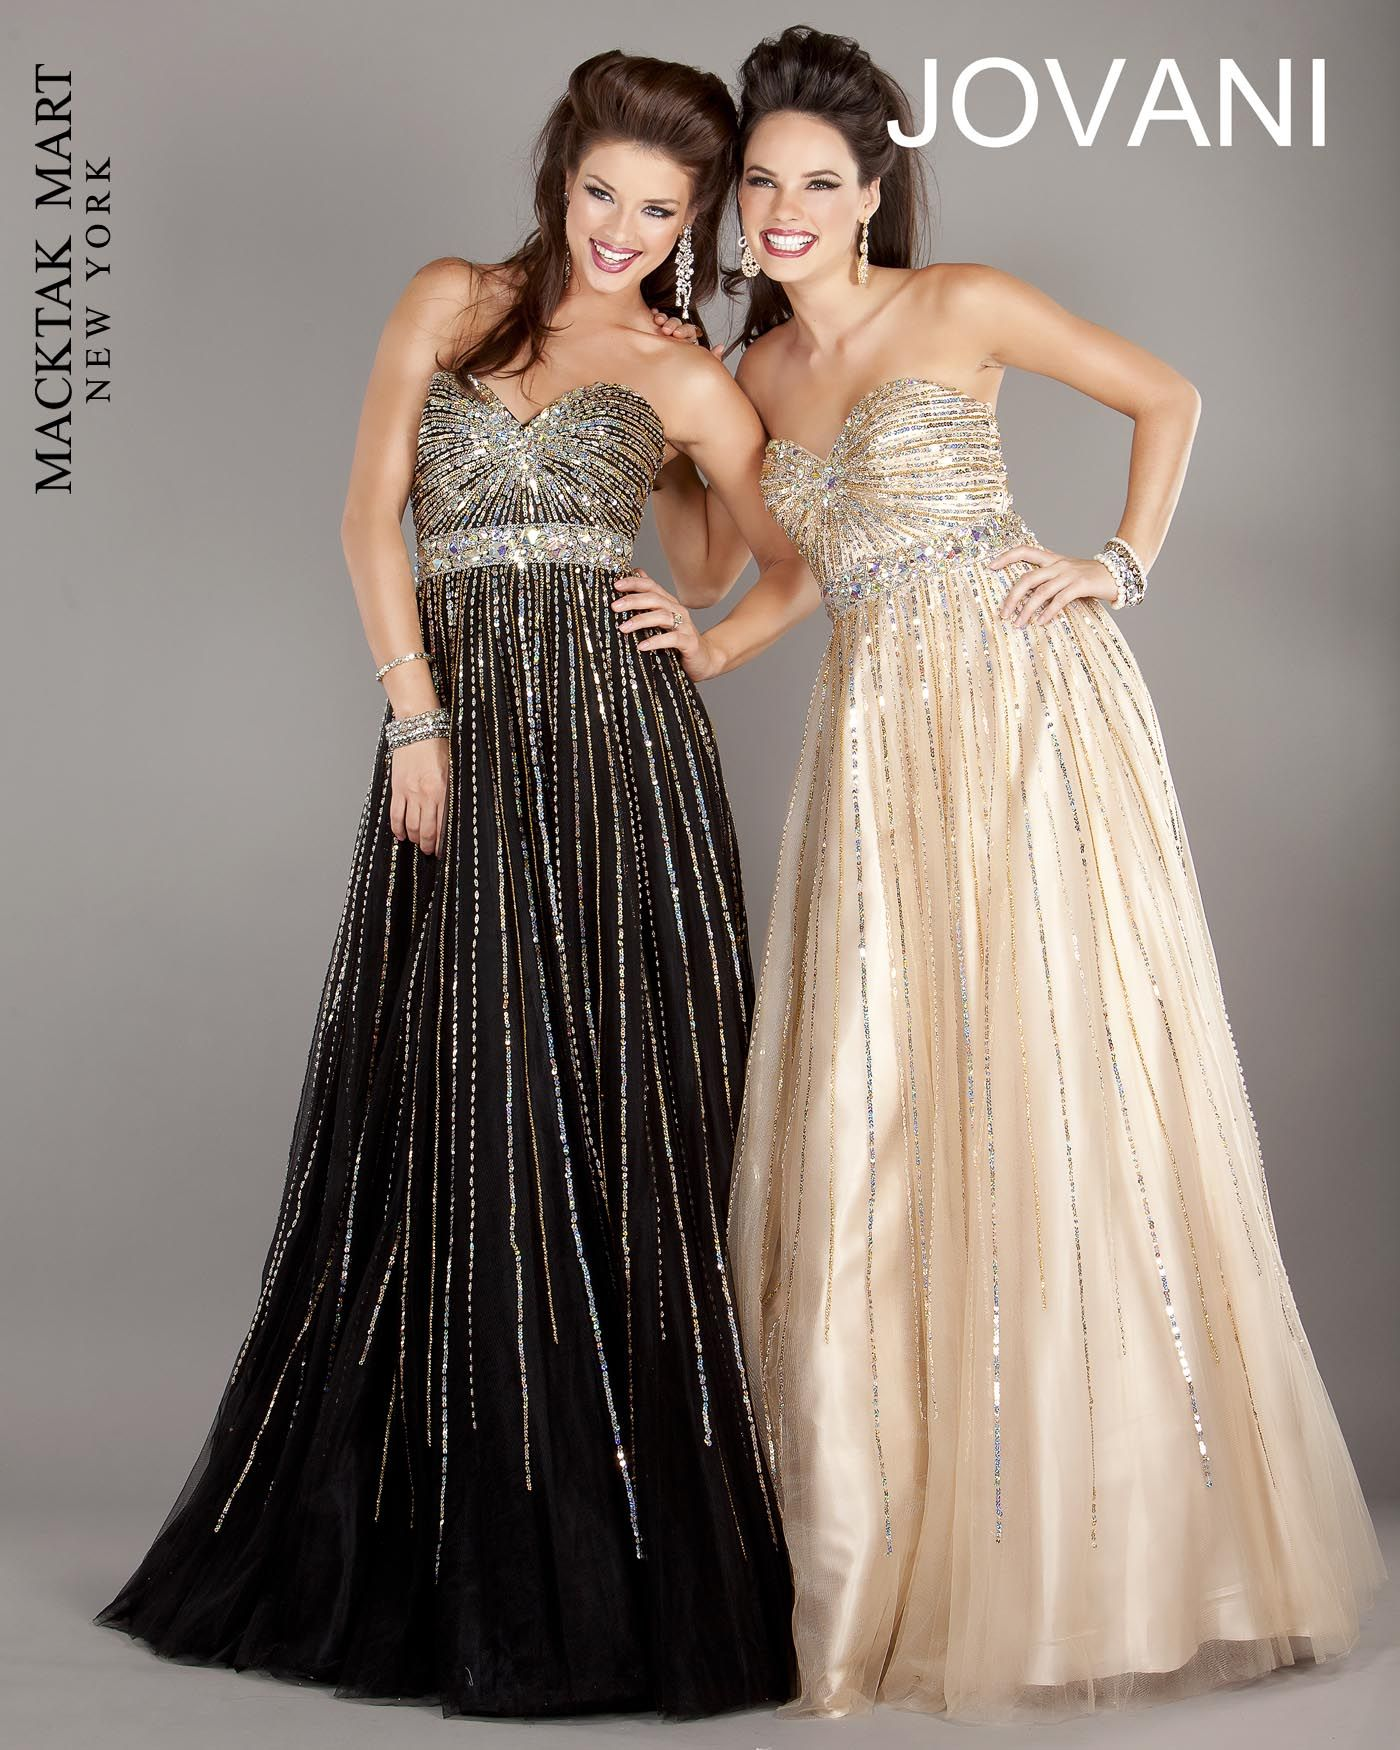 Jovani 634 Dress! http://macktakmart.com/jovani-prom-dresses-634 ...